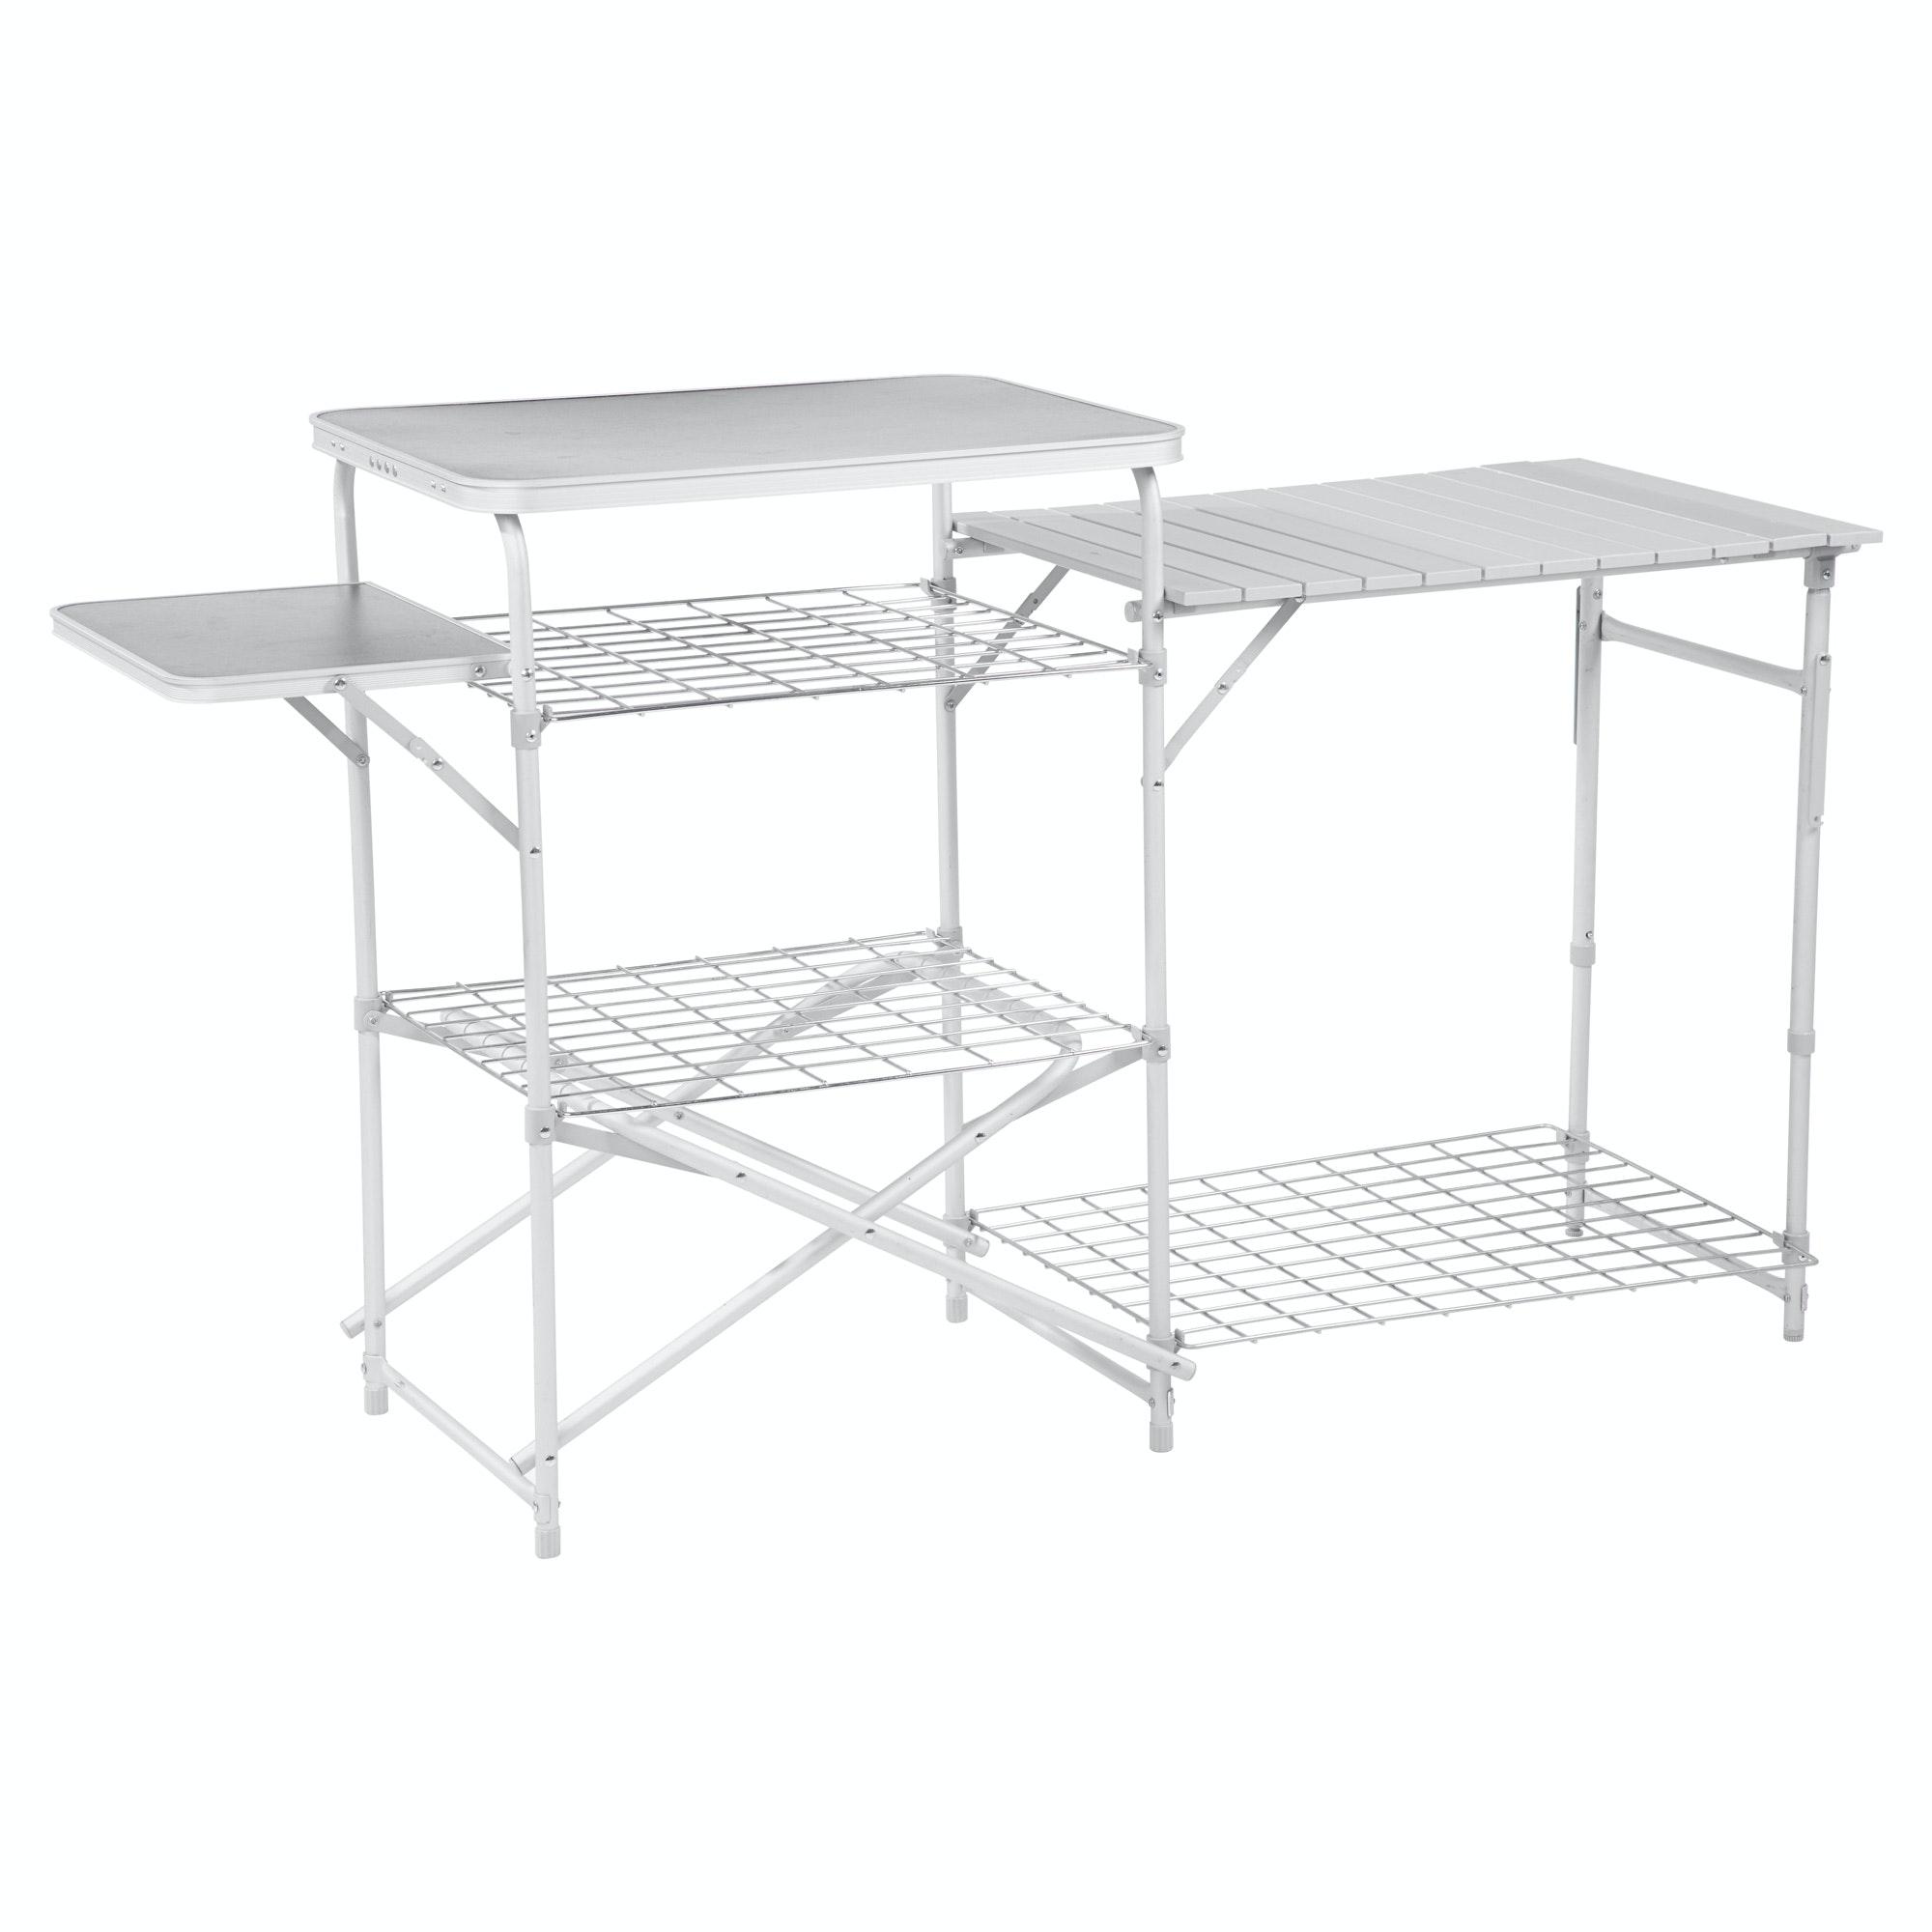 NEW Kathmandu Retreat Foldable Portable Shelves Table